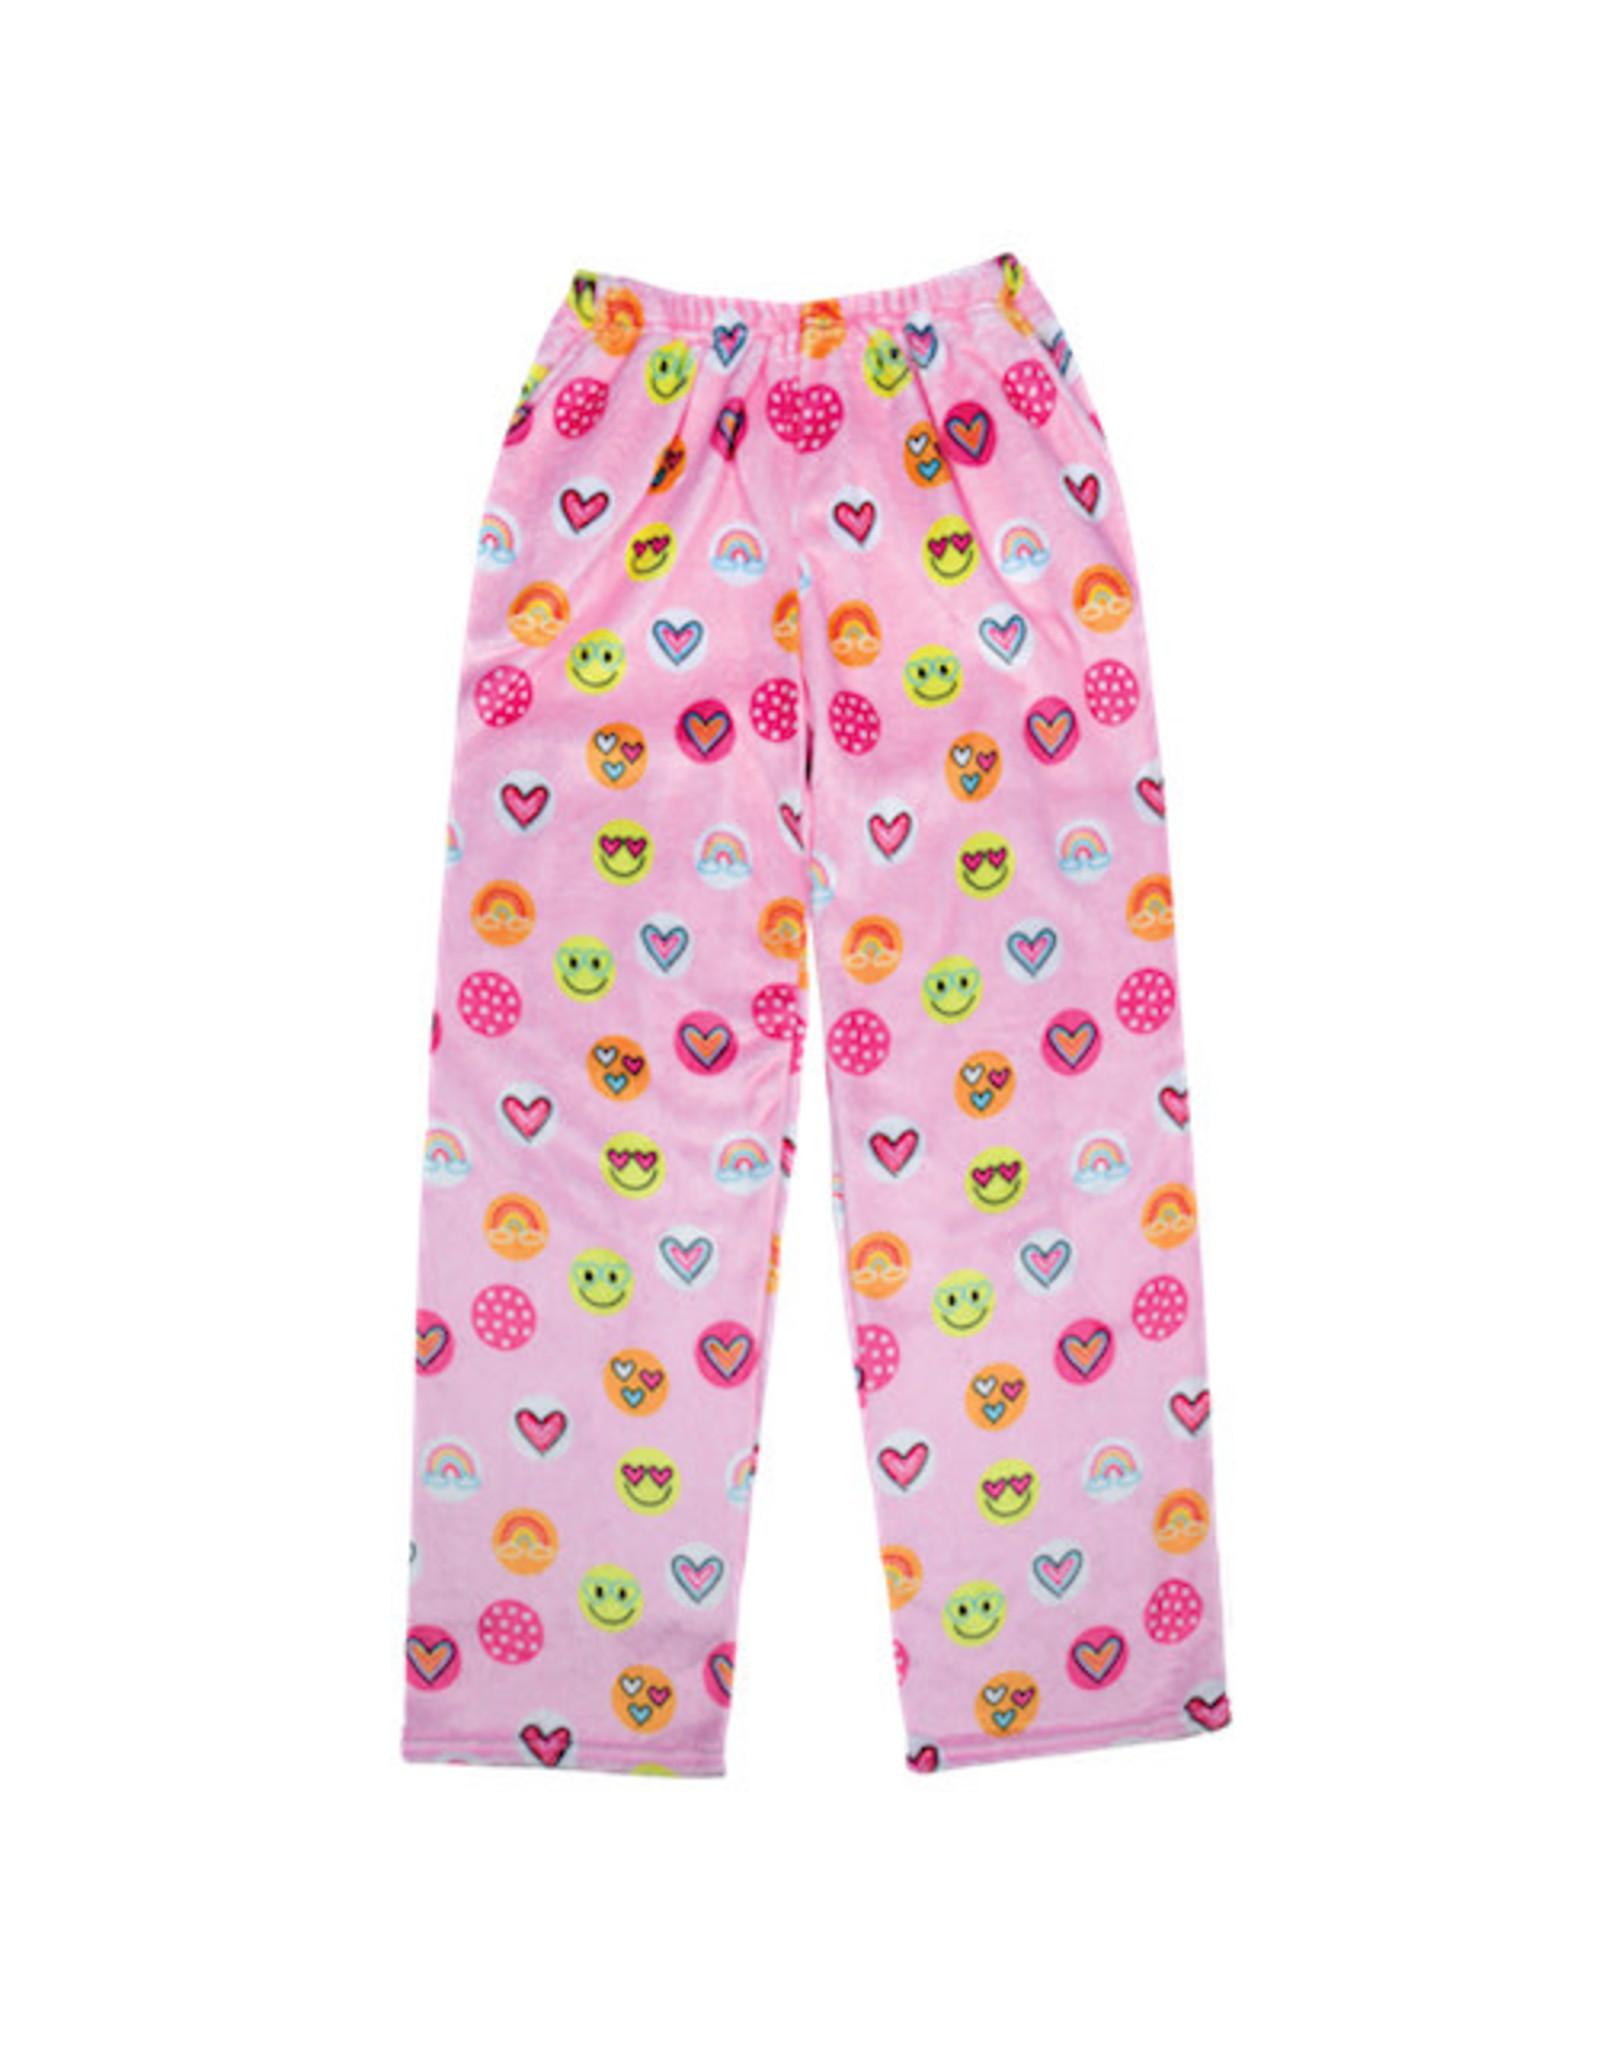 Iscream Sunshine Funshine  Plush Pants